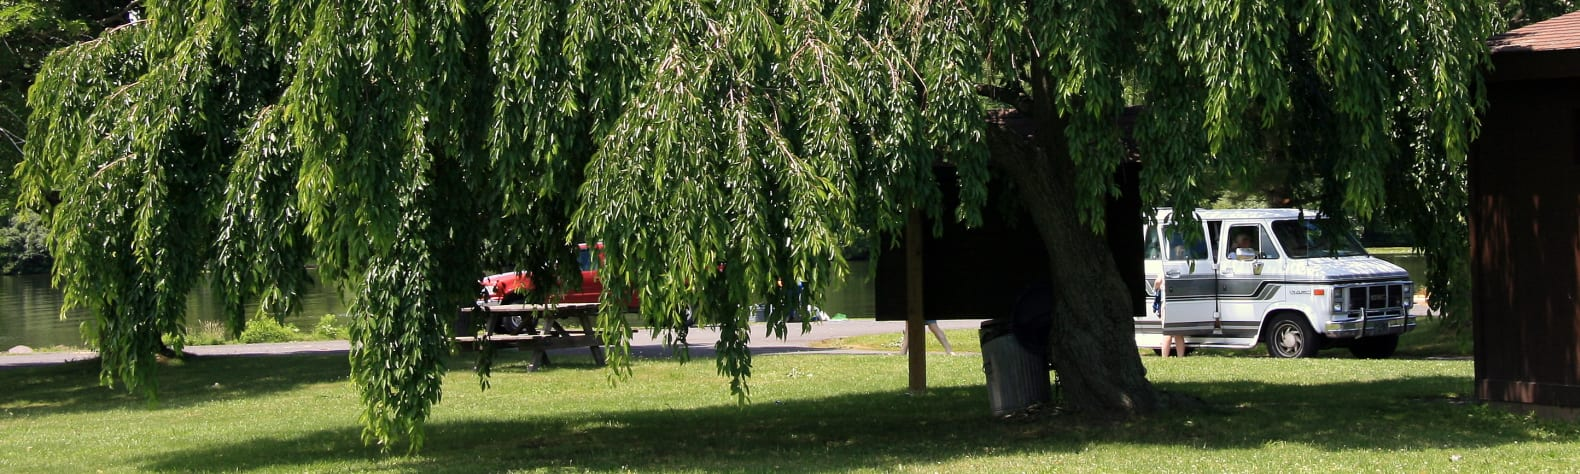 20 Amazing Campsites Near Nockamixon State Park